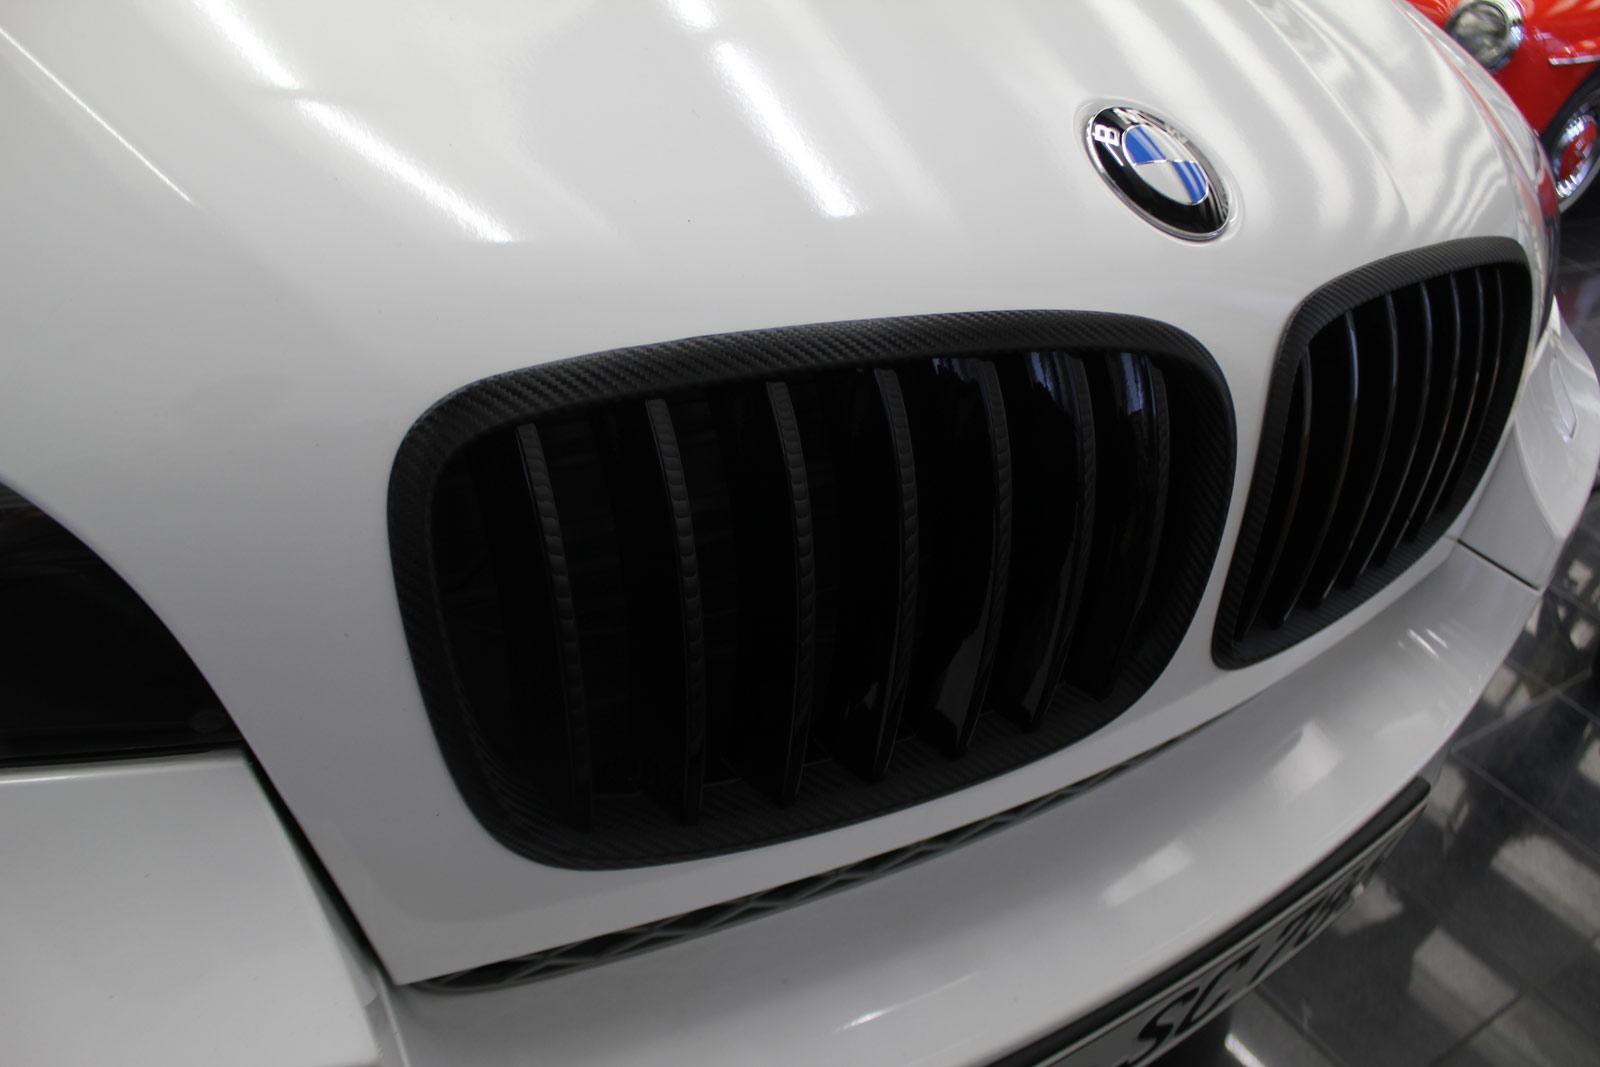 BMW_X6_FOLIERUNG_WEISS_GLANZ_PLUS_CARBON_03